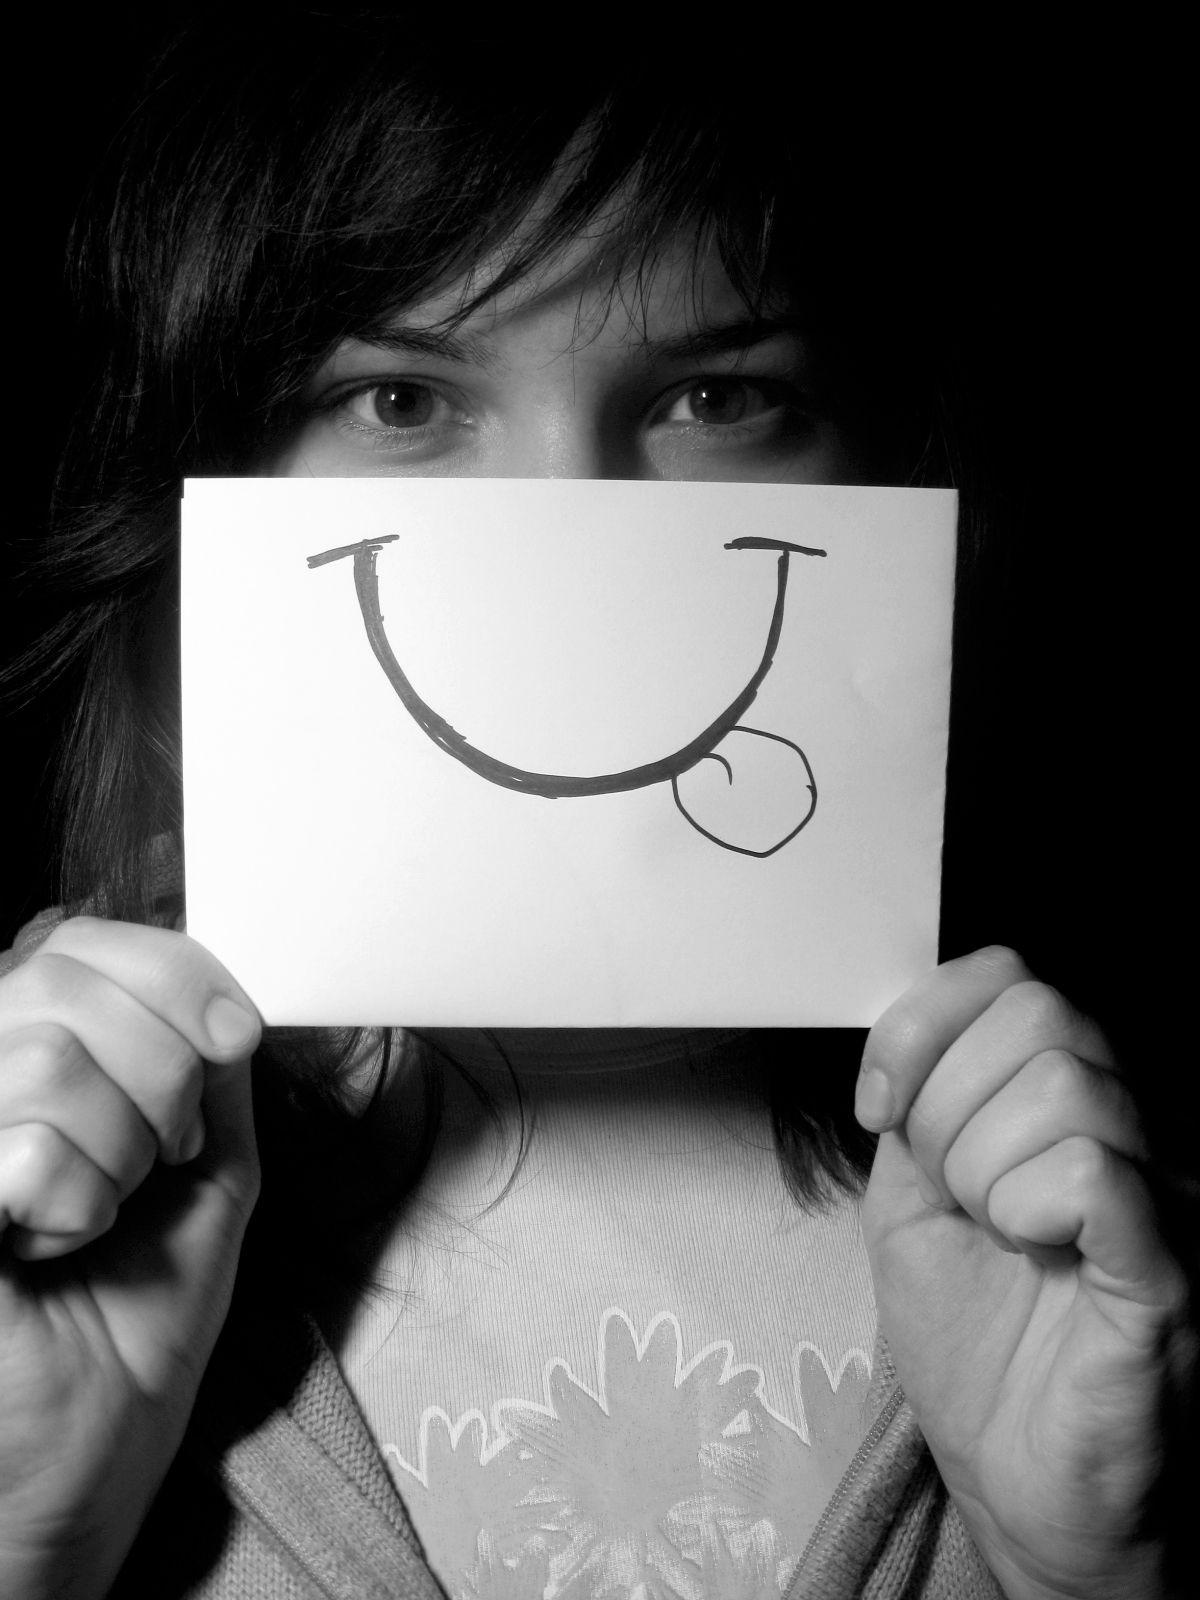 http://brookemosswriter.blogspot.com/2011/07/today-i-need.html